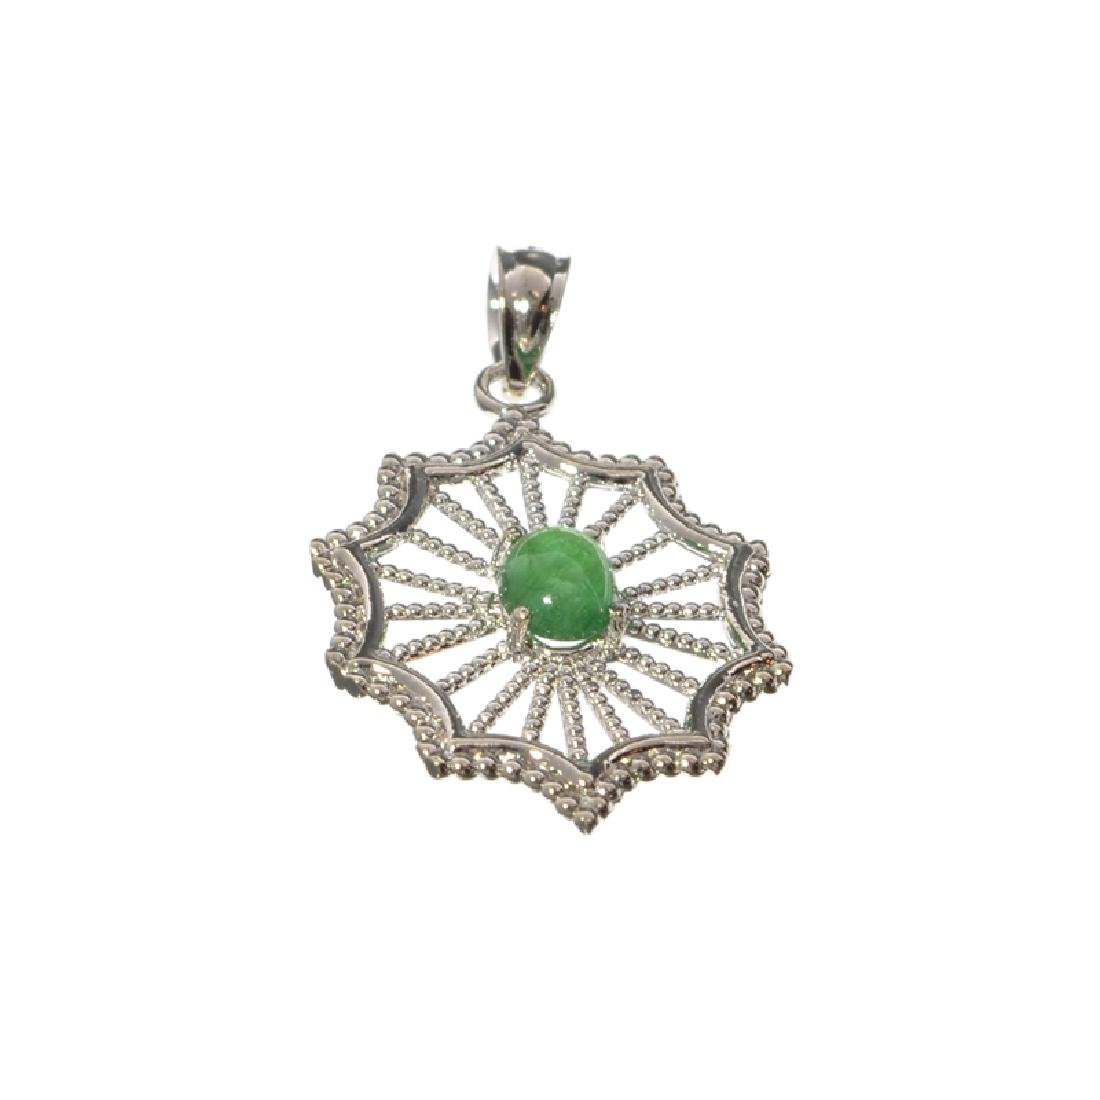 APP: 0.2k Fine Jewelry 0.38CT Cabochon Green Emerald